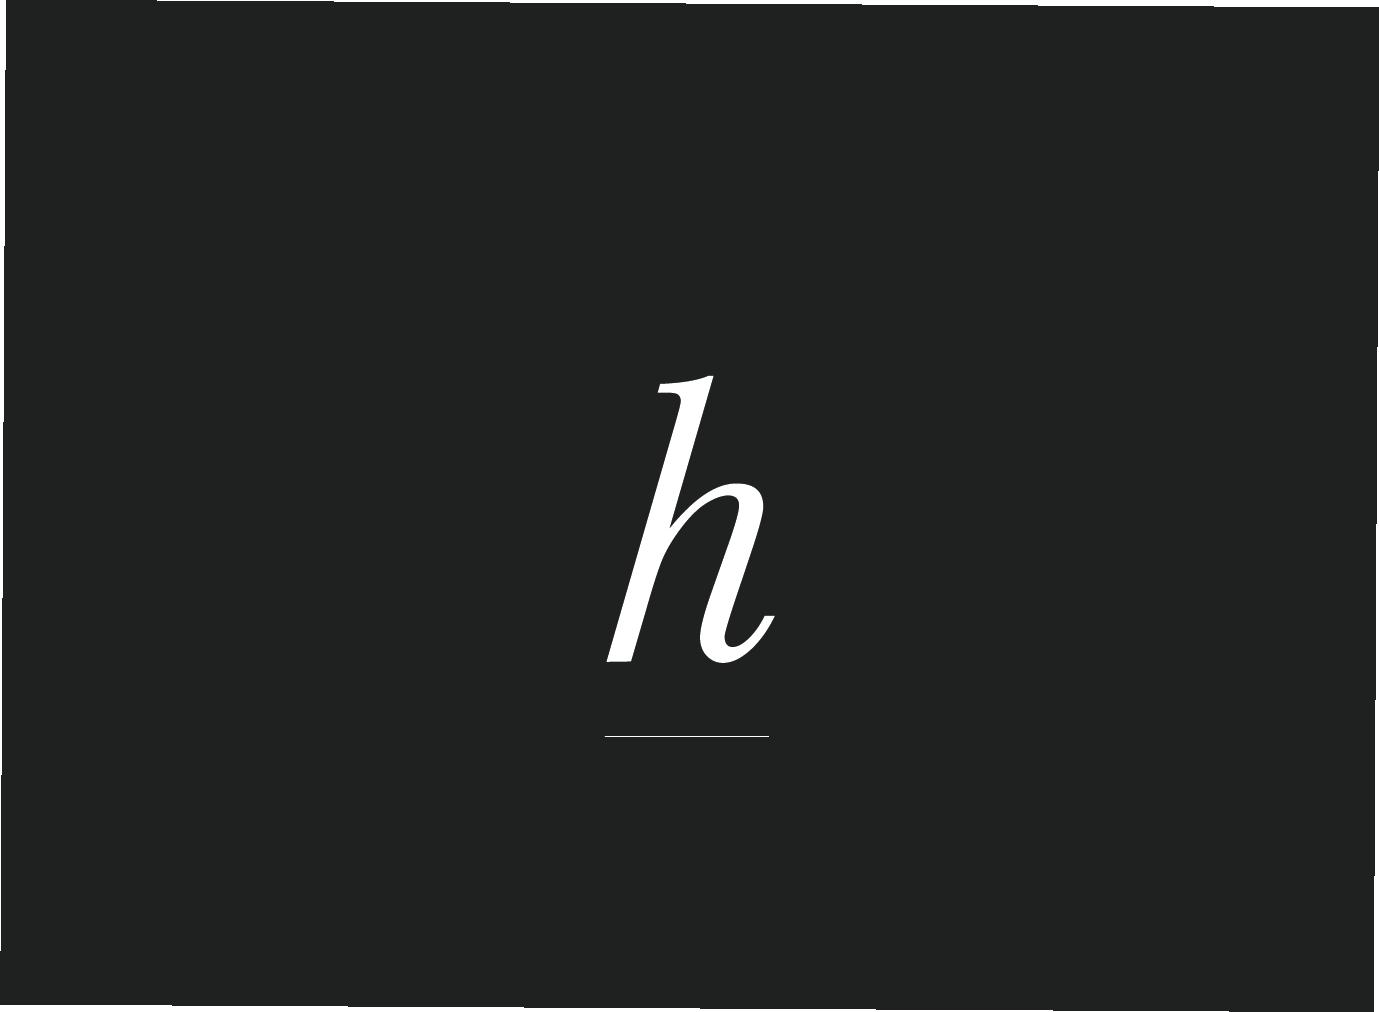 IDENTITE VISUELLE - STUDIO QUOTIDIEN - HORTENSE MONTARNAL